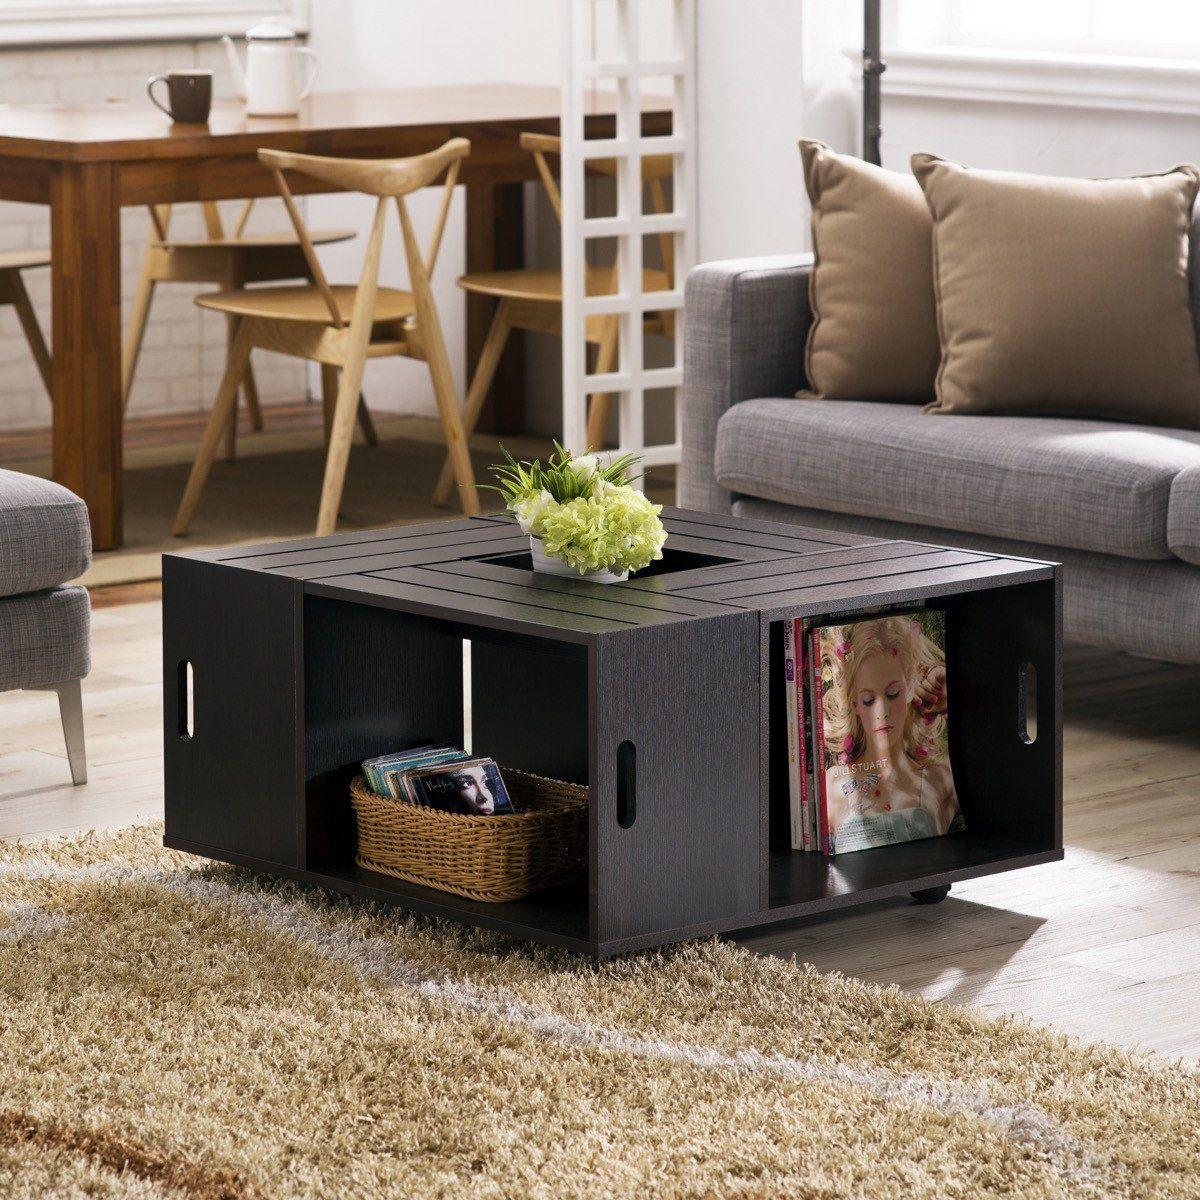 Furniture Of America Zuko Multi Storage Crate Coffee Table Espresso Wooden Coffee Table Designs Coffee Table With Drawers Rustic Coffee Tables [ 1200 x 1200 Pixel ]